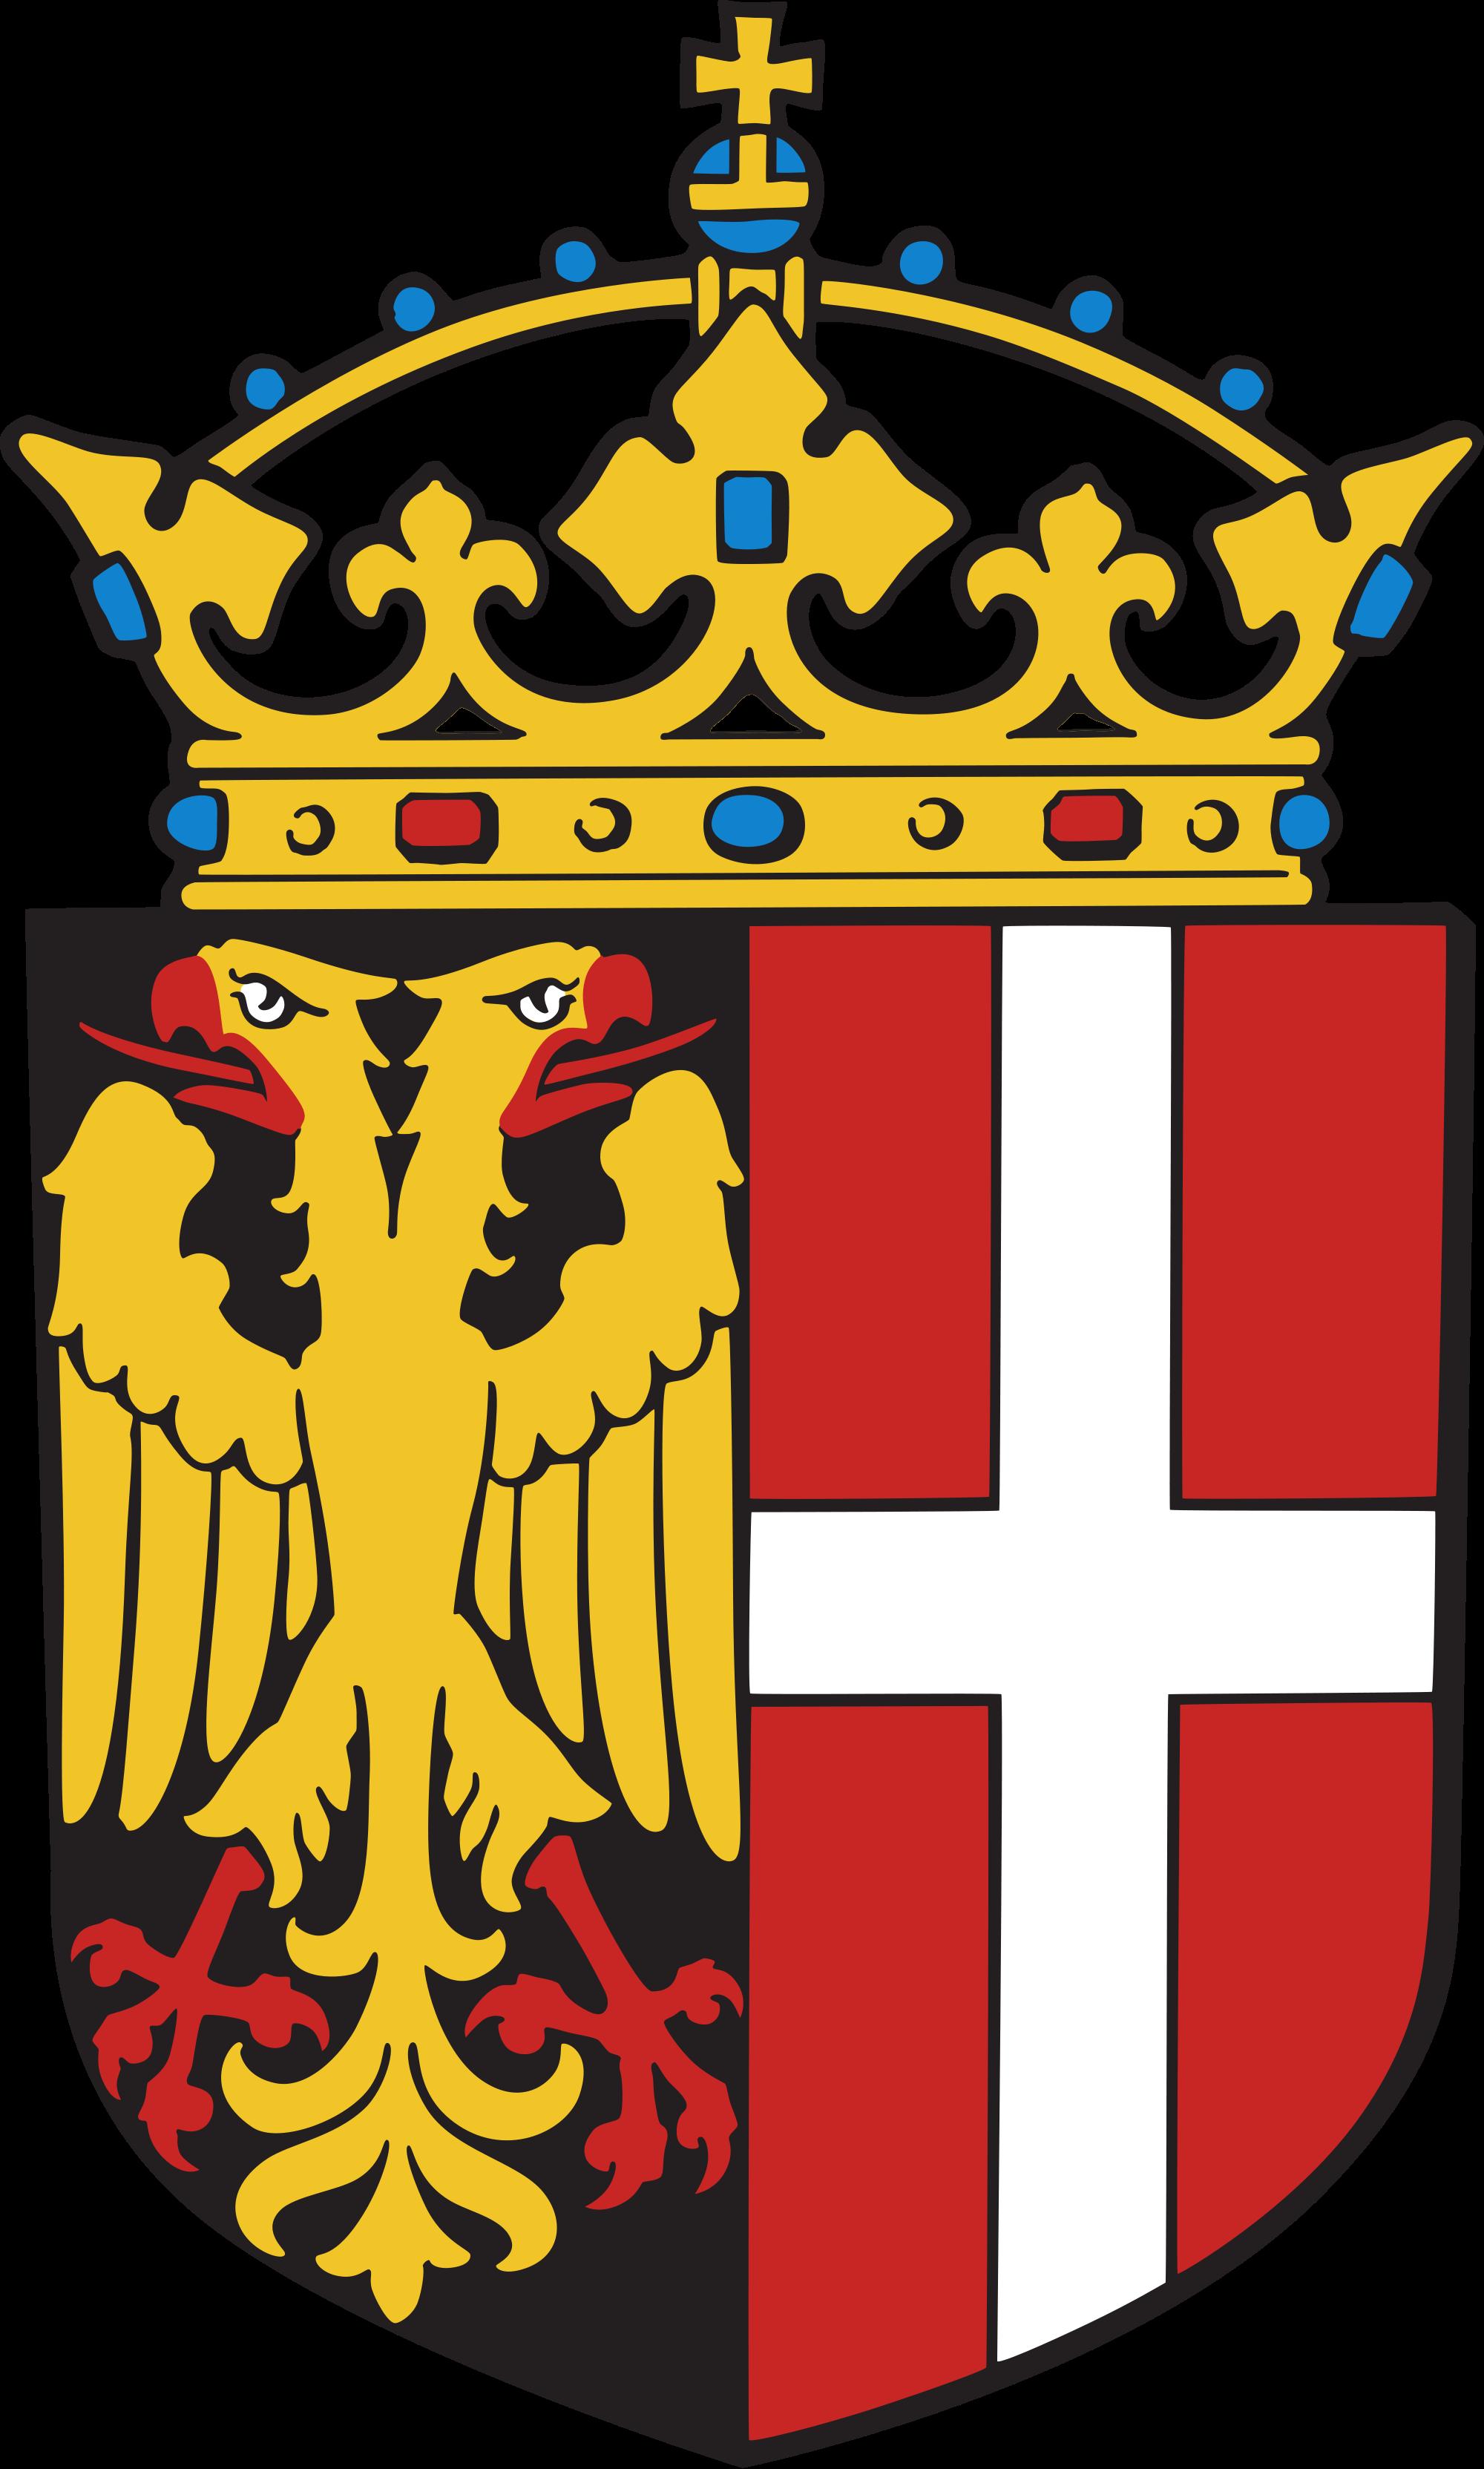 File:Neuss Stadtwappen cmyk.svg.